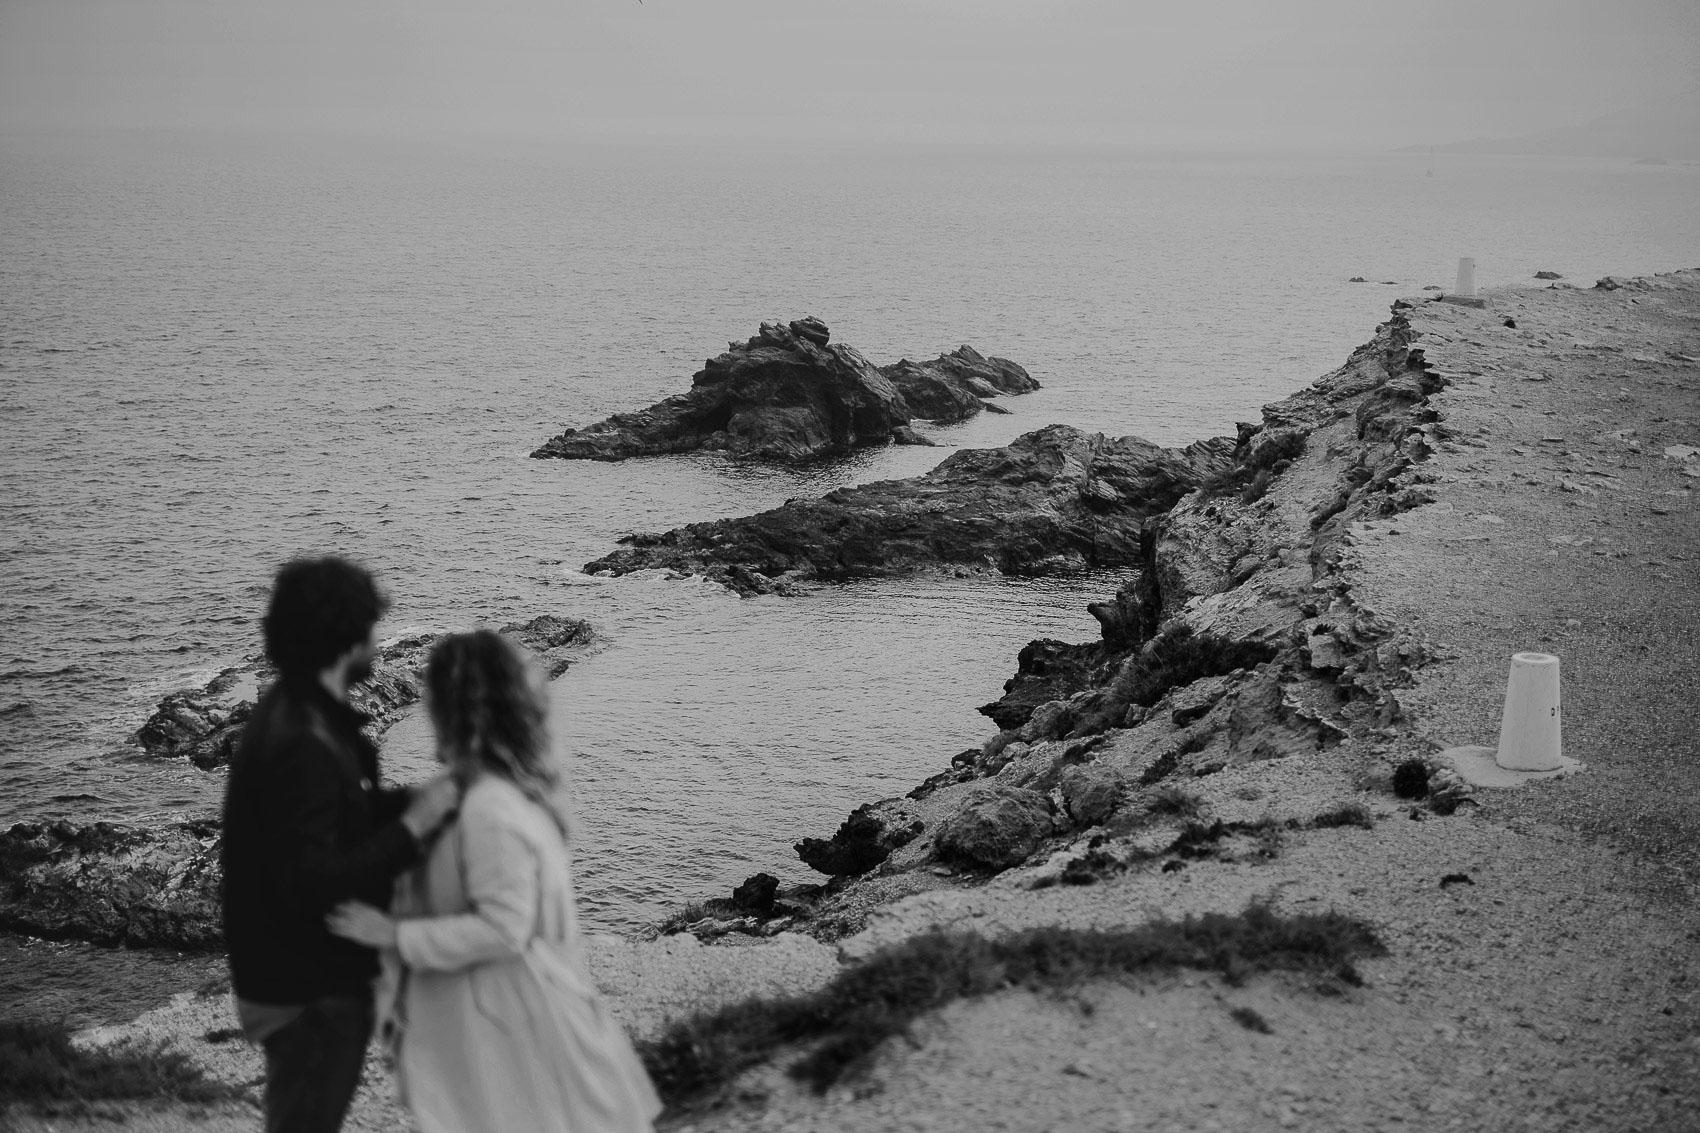 pareja playa frio abrigo abrazo mar vistas acantilado cabo de palos